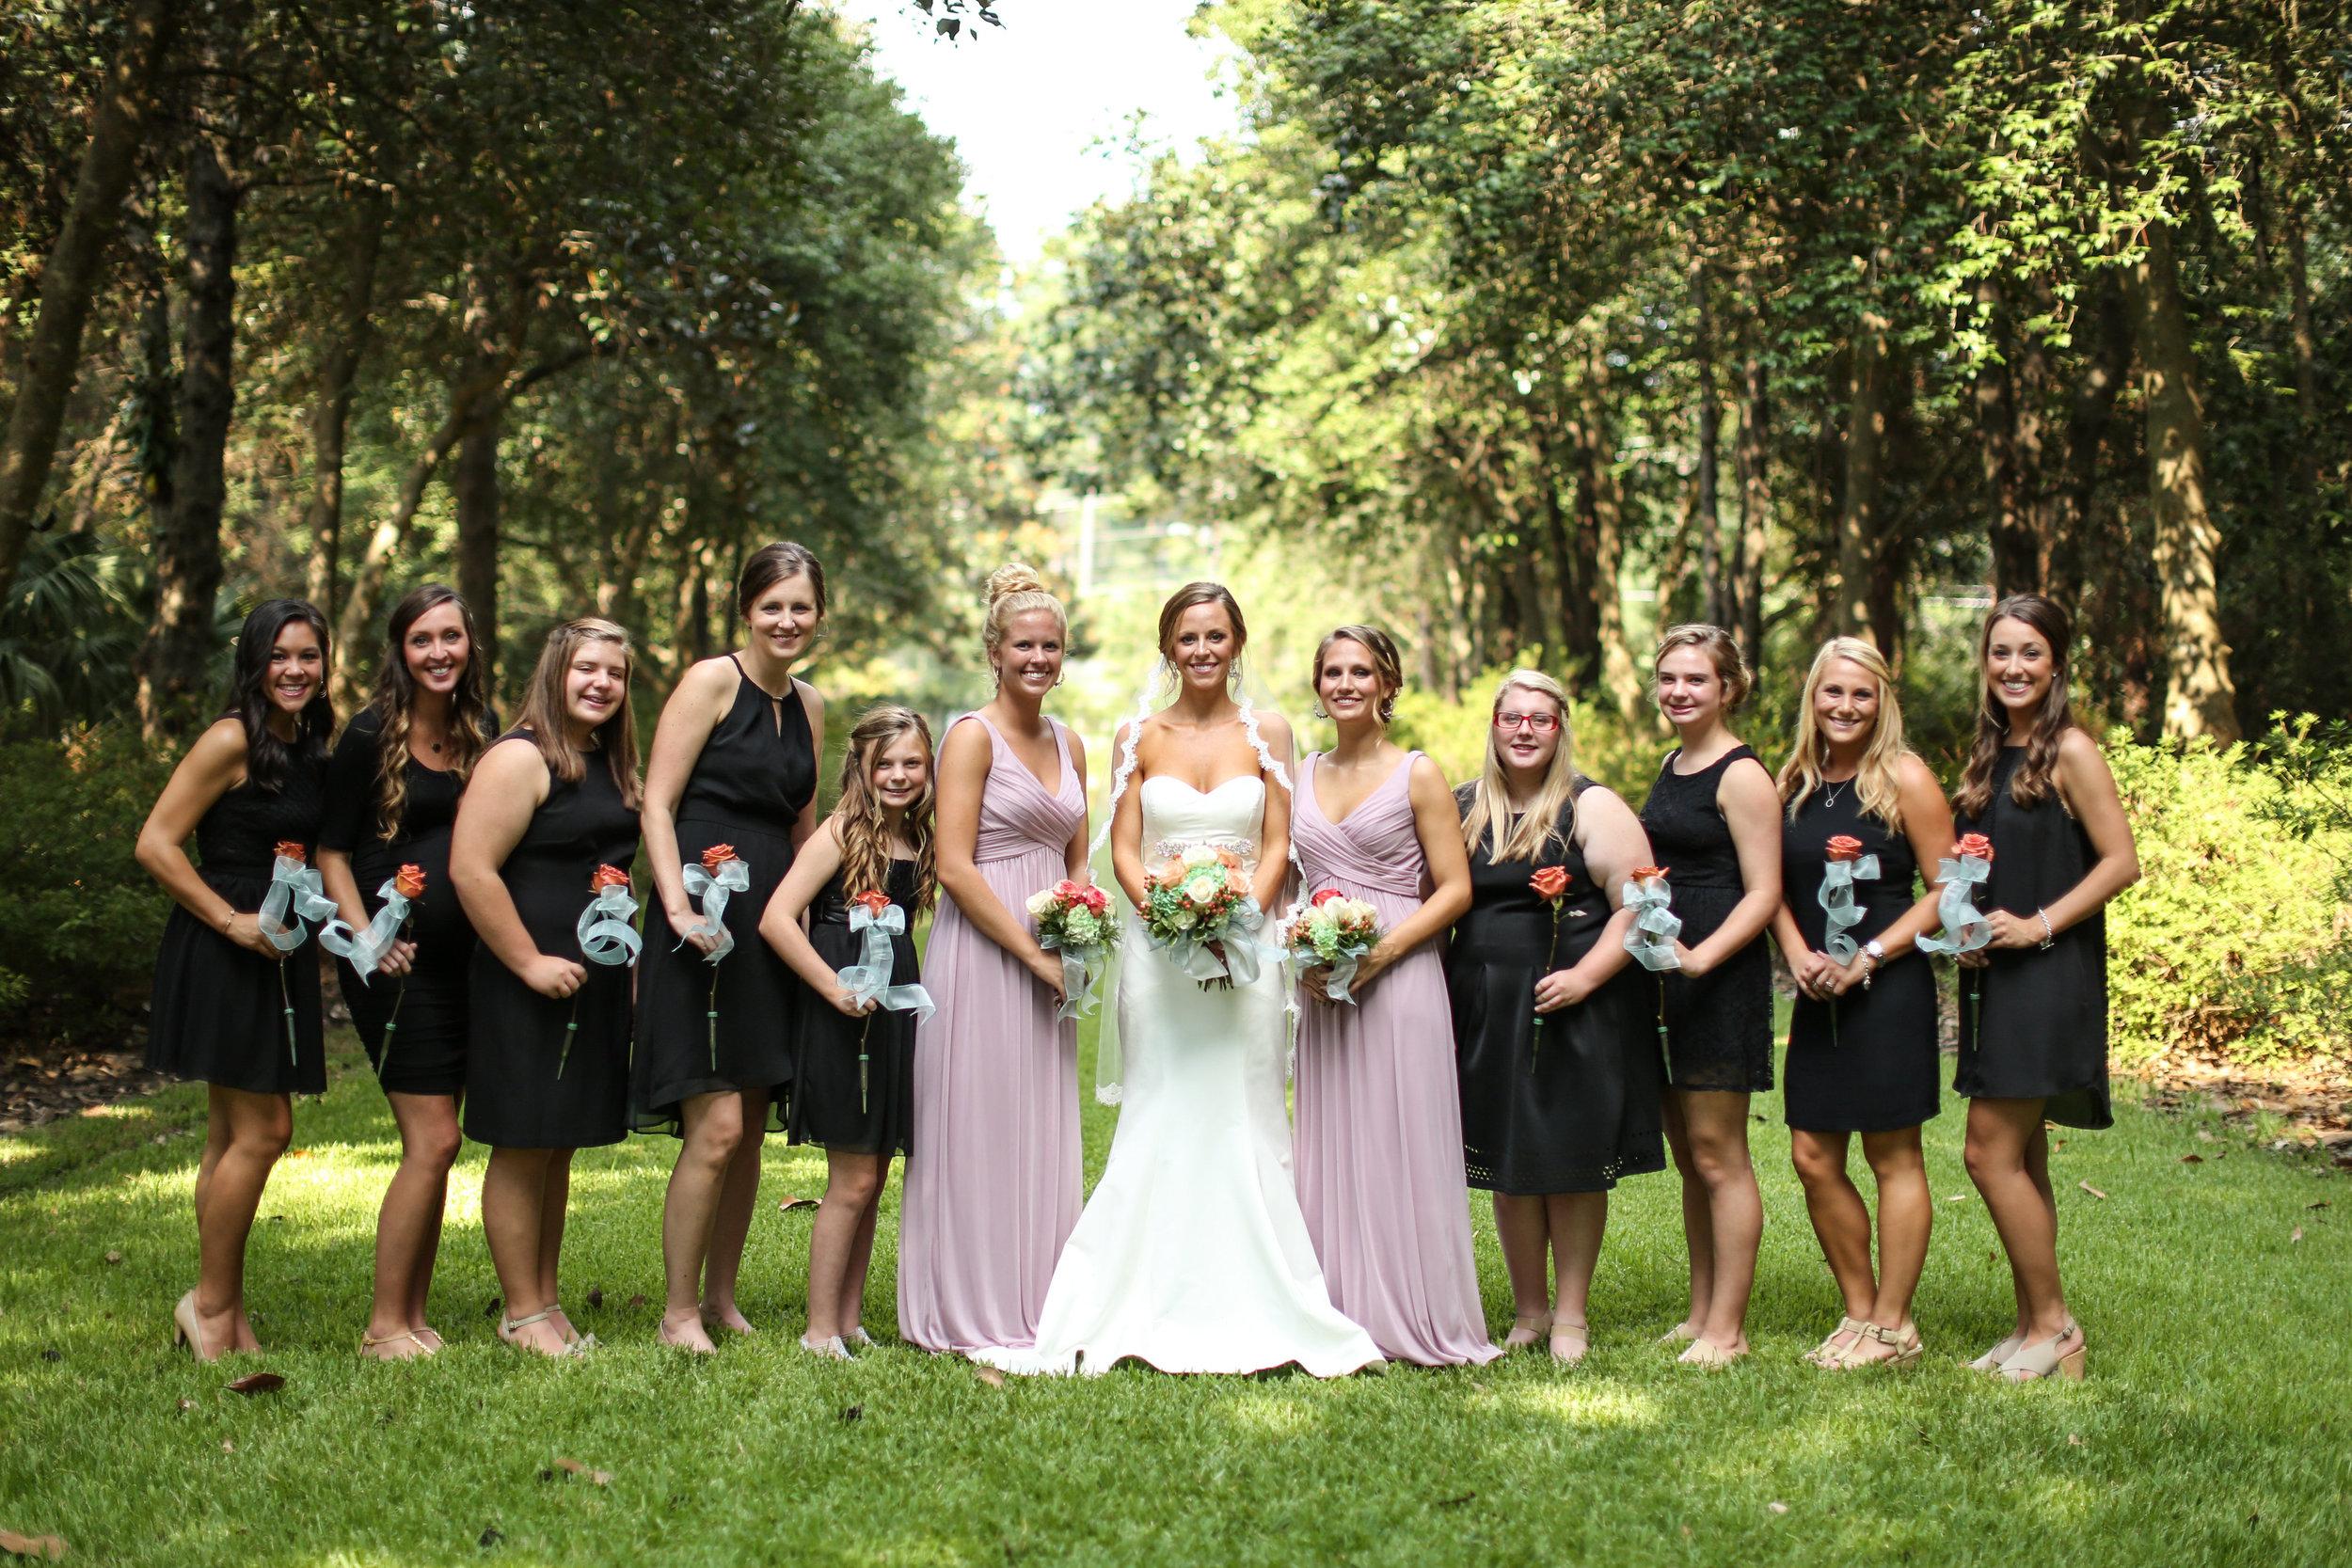 finnegan-photography-ivory-and-beau-bridal-boutique-nicole-miller-dakota-jaclyn-jordan-anne-veil-savannah-bridal-boutique-savannah-wedding-dresses-savannah-weddings-statesboro-wedding-barn-wedding-savannah-bridal-georgia-bridal-boutique-9.jpg